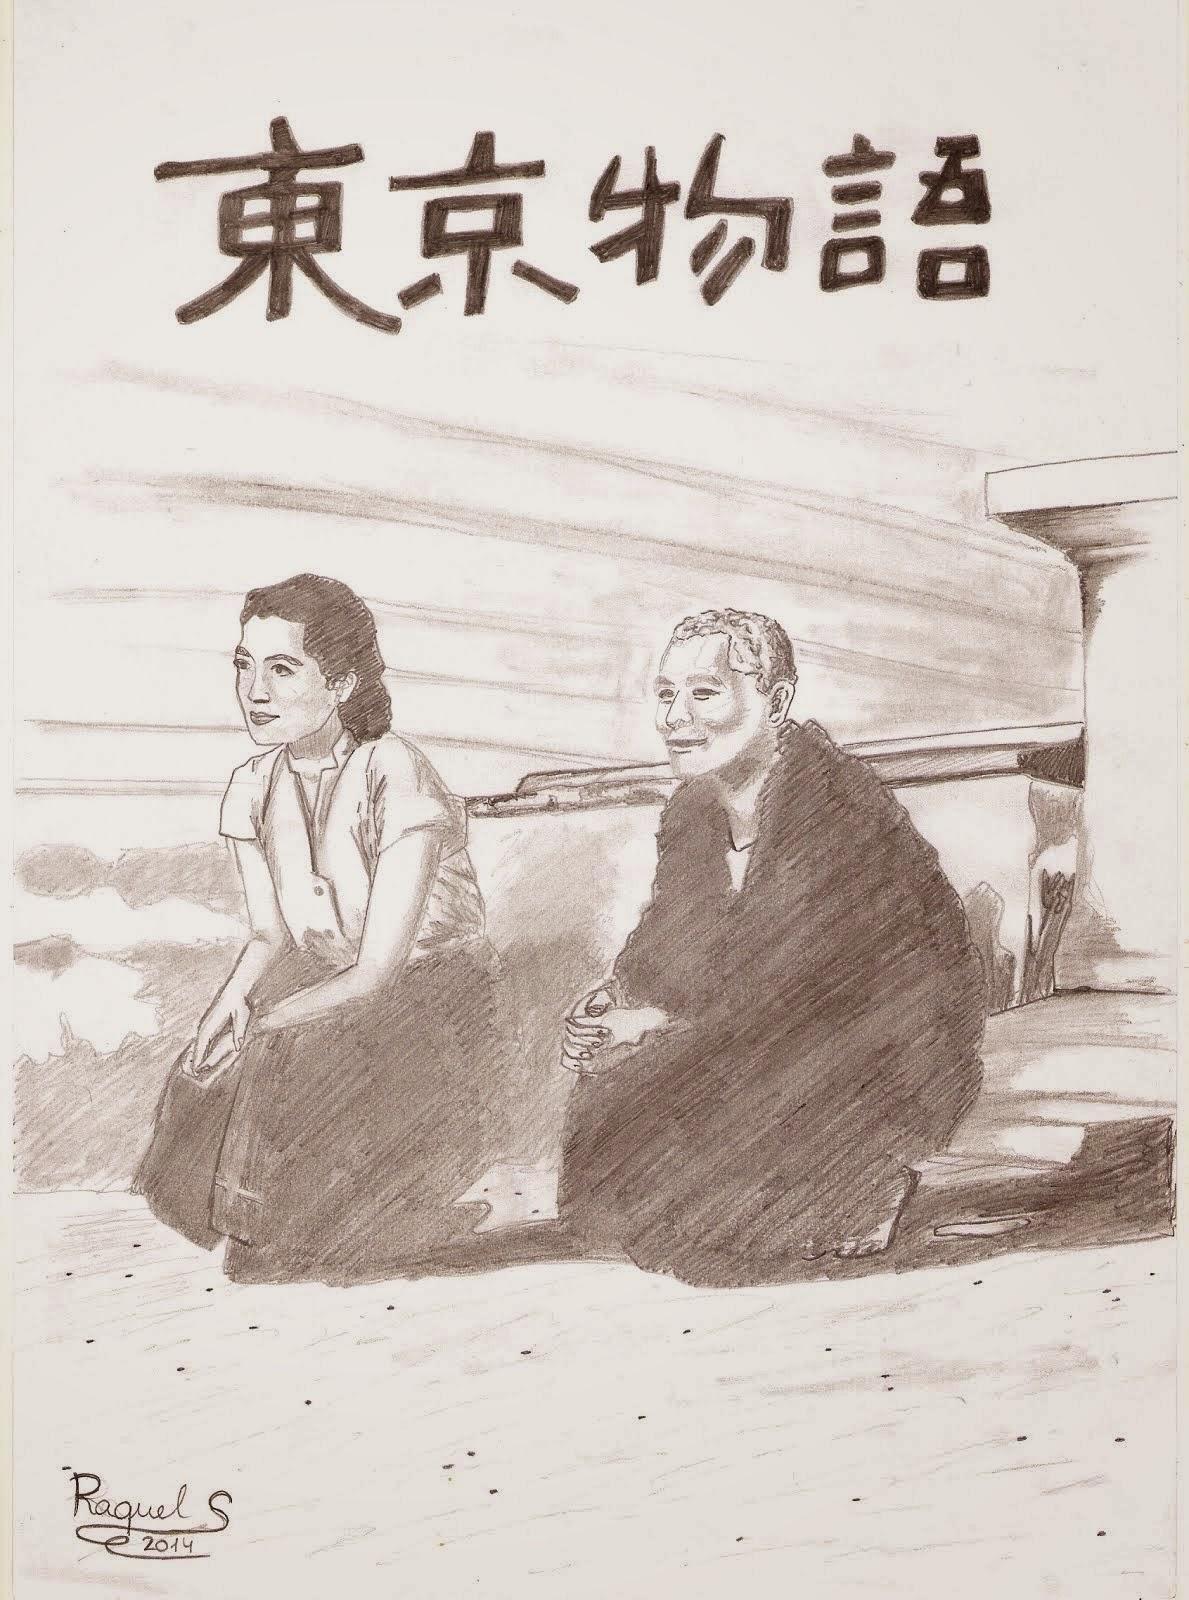 東京物語 - Tokyo Monogatari